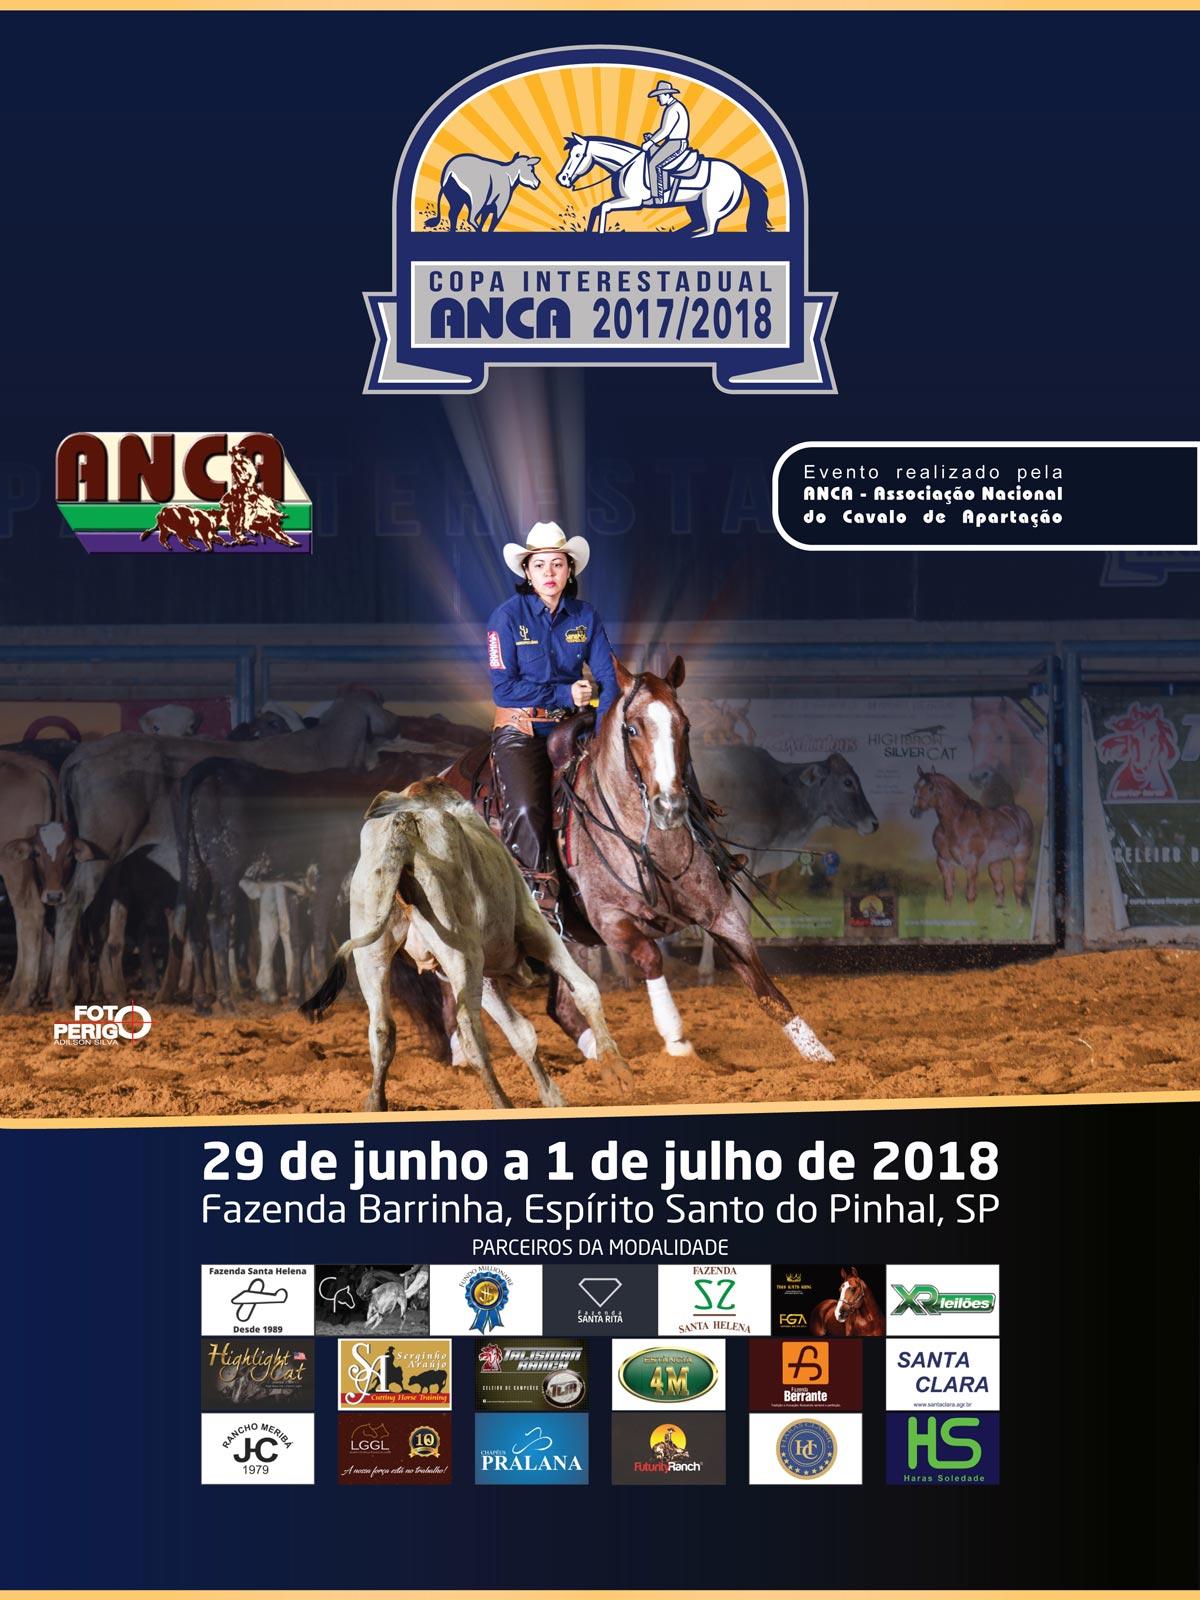 Copa Interestadual ANCA 2017/2018